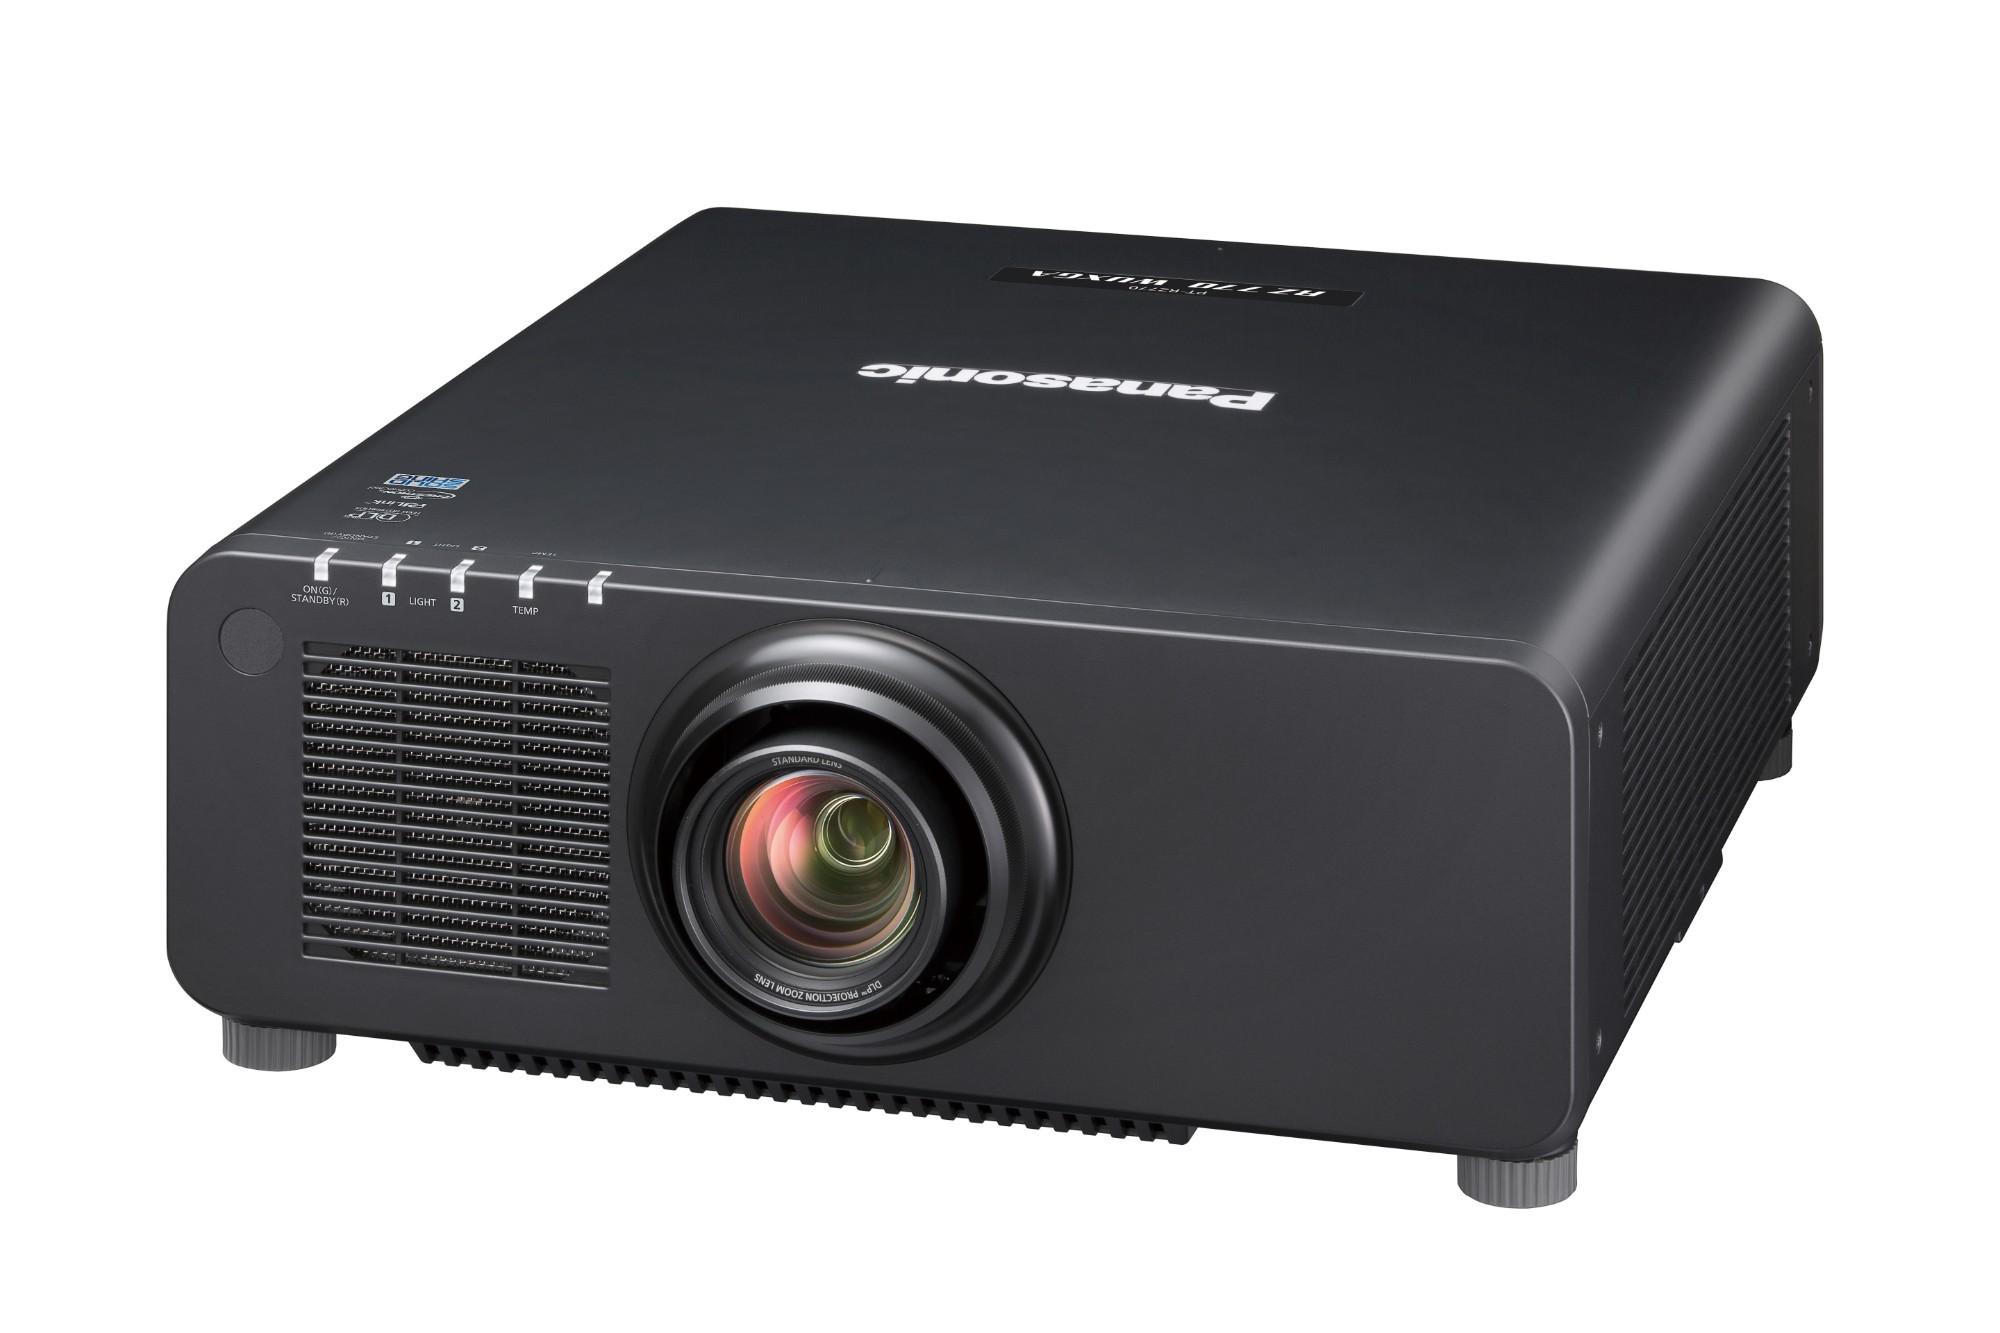 Panasonic PT-RZ770BEJ data projector 7200 ANSI lumens DLP WUXGA (1920x1200) Desktop projector Black